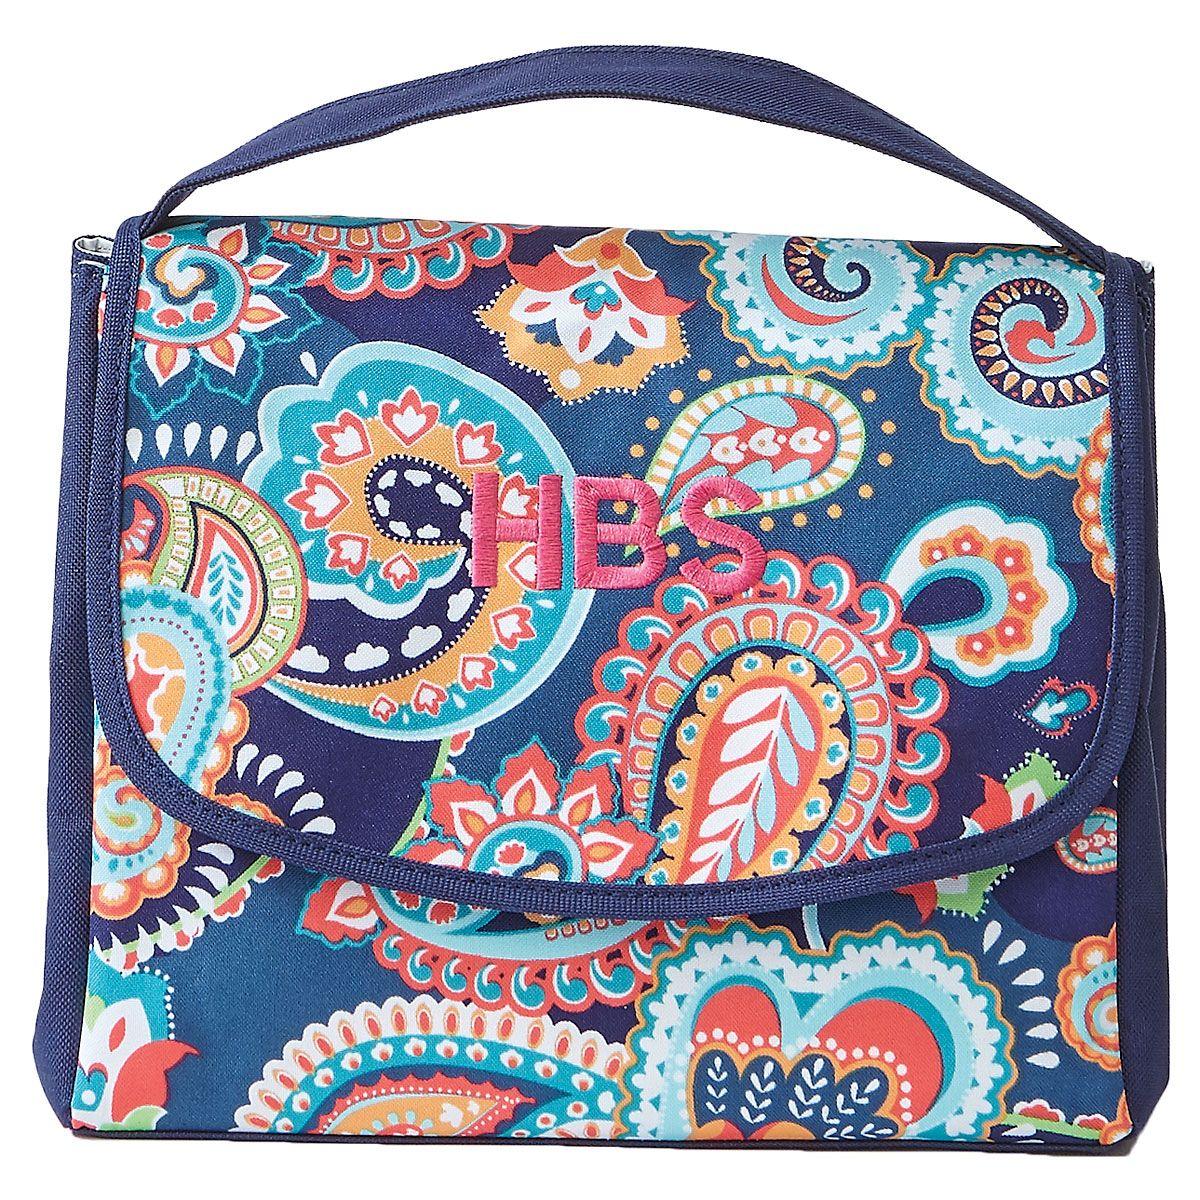 Emerson Blue Lunch Bag